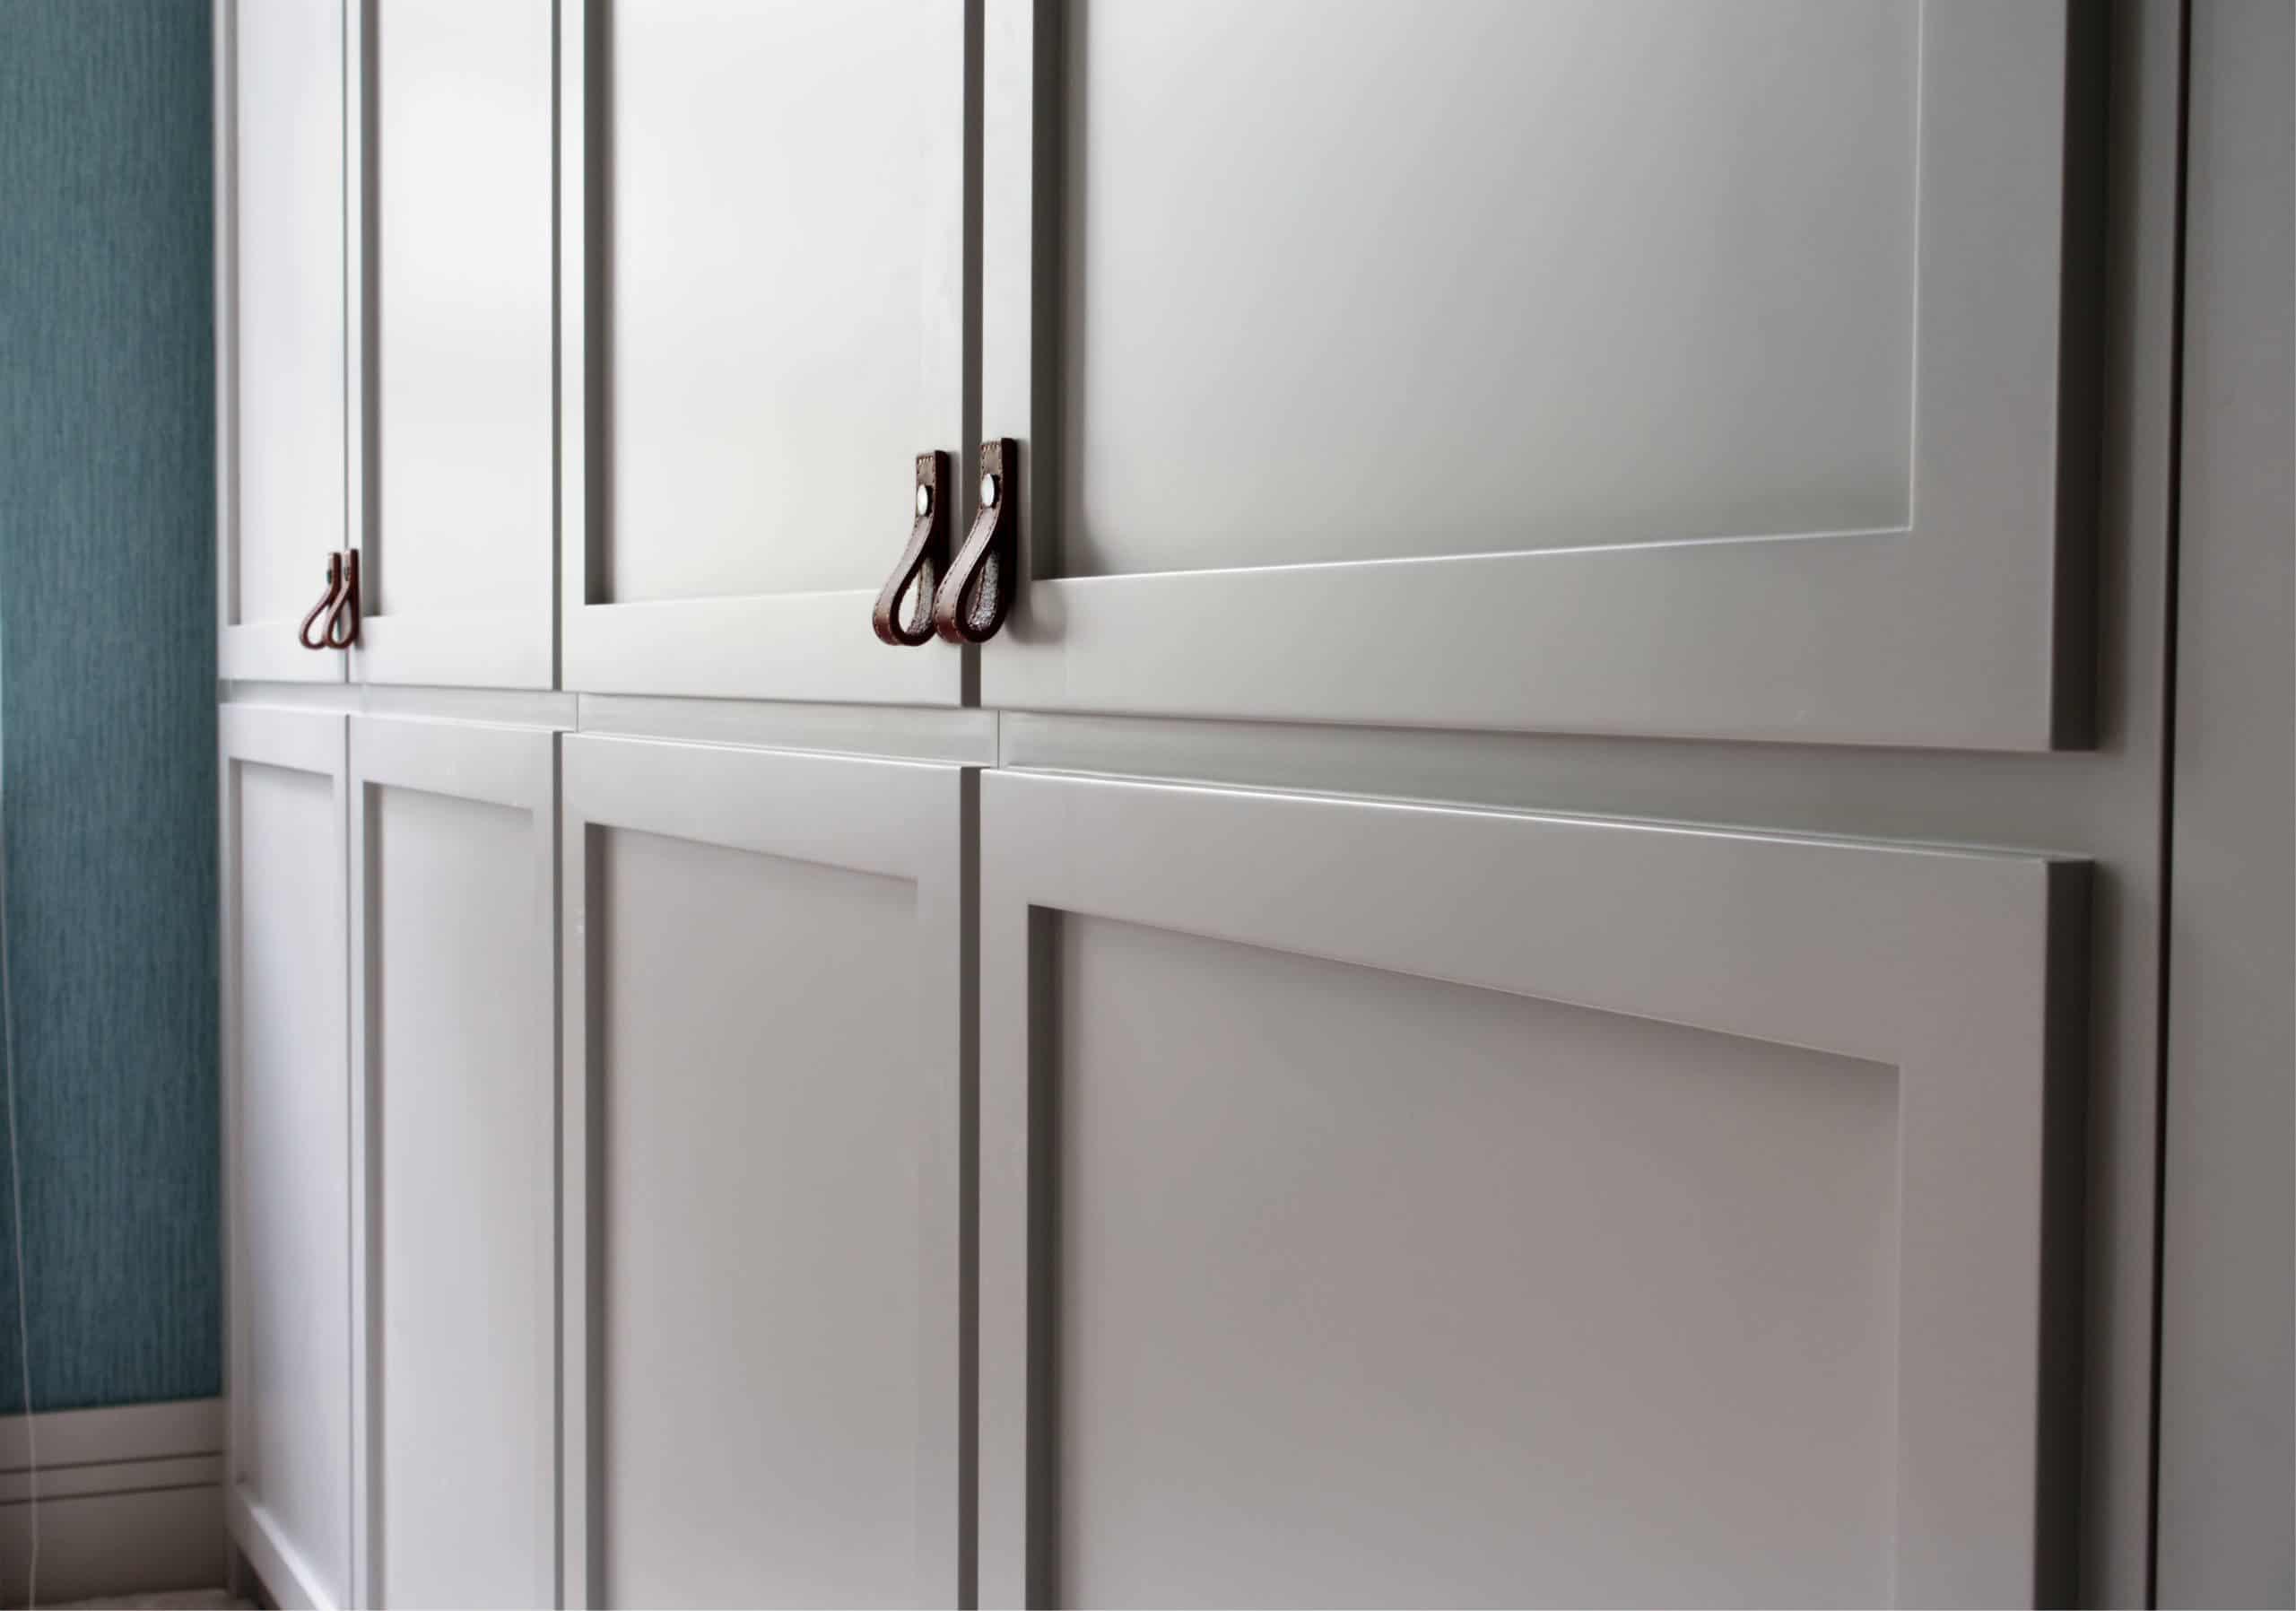 Leather pull wardrobe handles